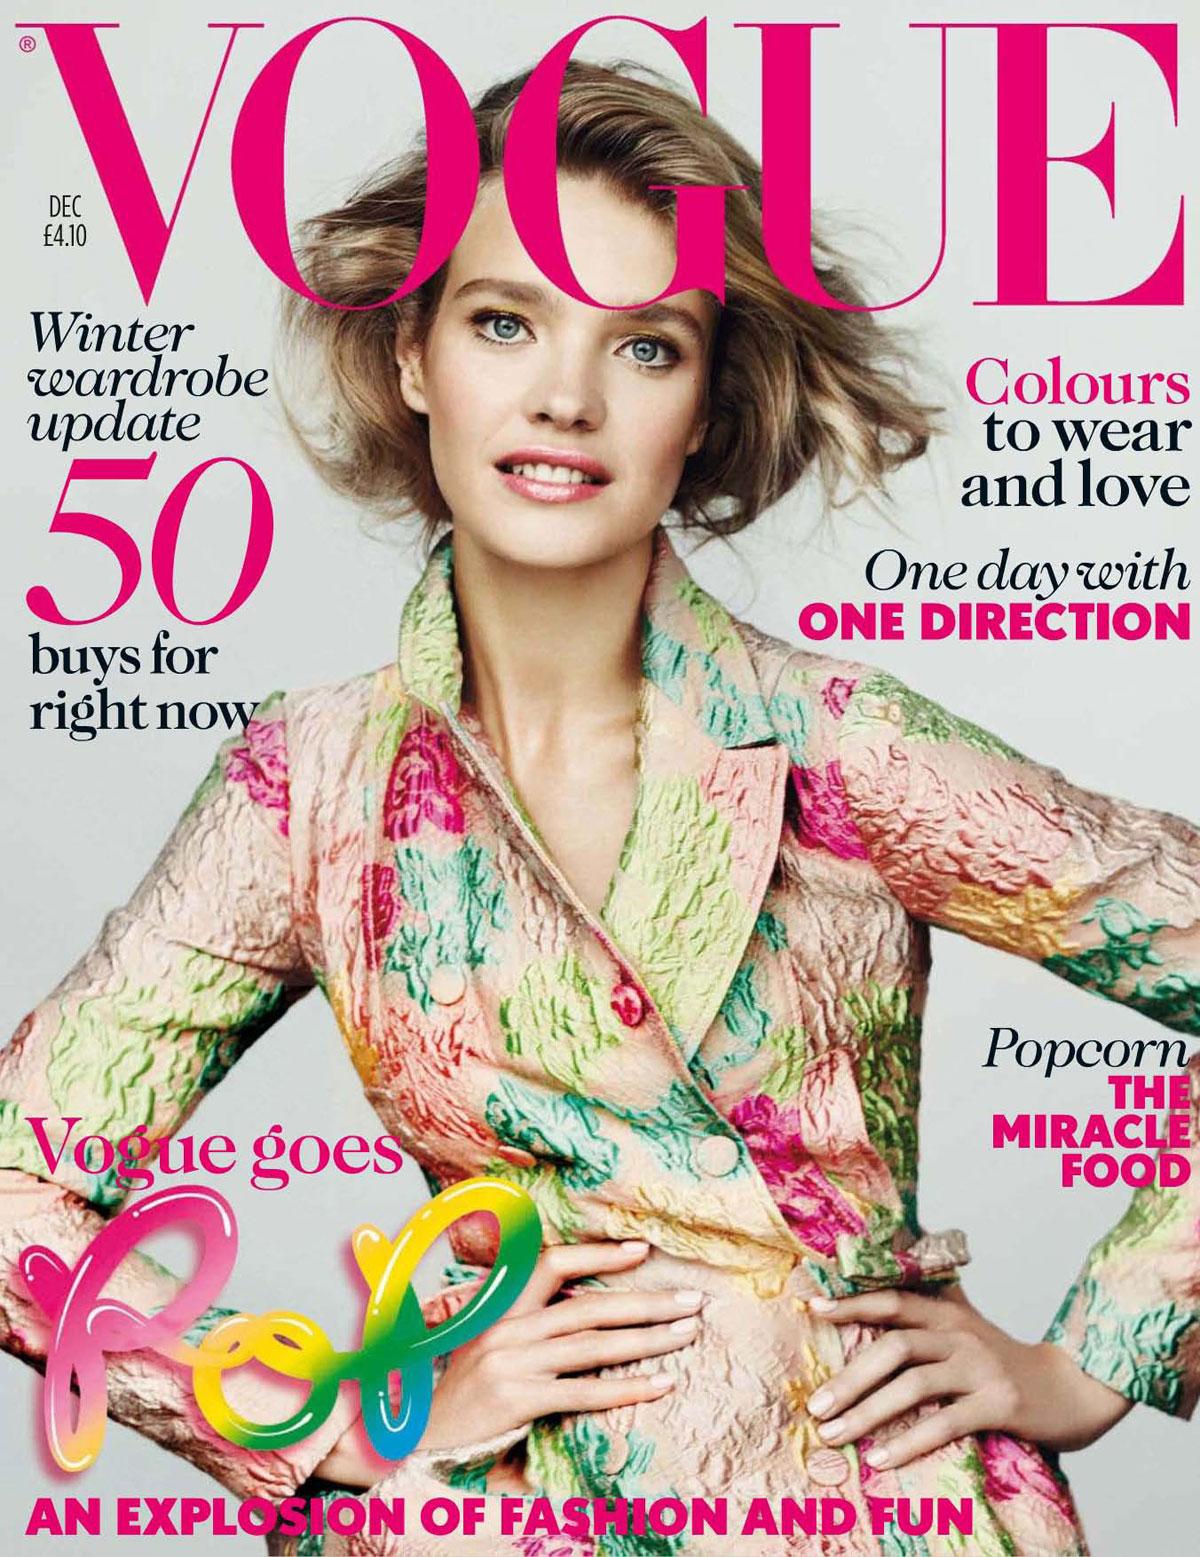 Vogue Magazine Uk May 2015 Issue: NATALIA VODIANOVA In Vogue Magazine, UK December 2012